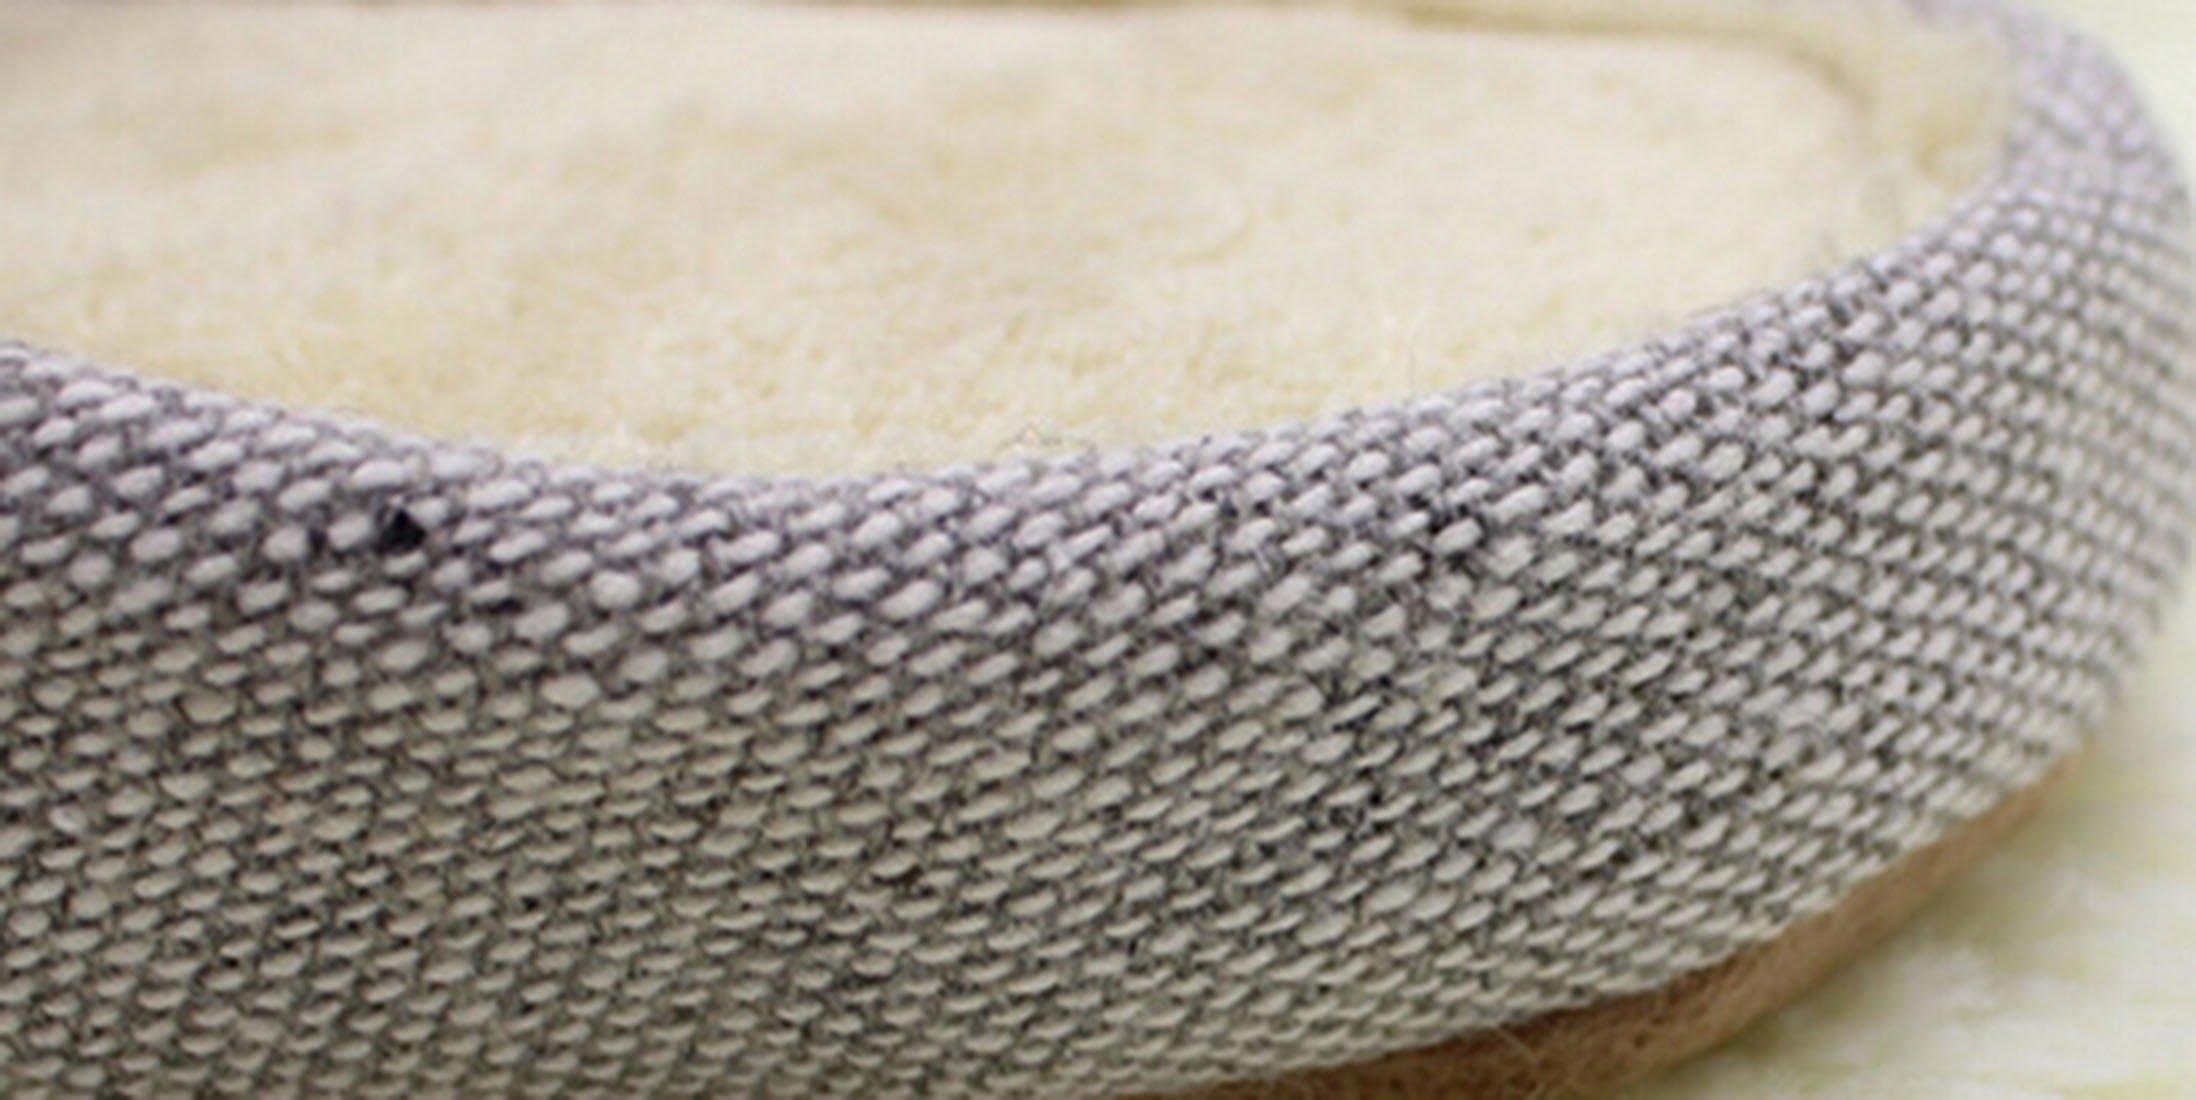 Bronze Times(TM) House Slippers,Womens Coral Fleece Memmory Foam Indoor Footwear,grey,M by Bronze Times (Image #3)